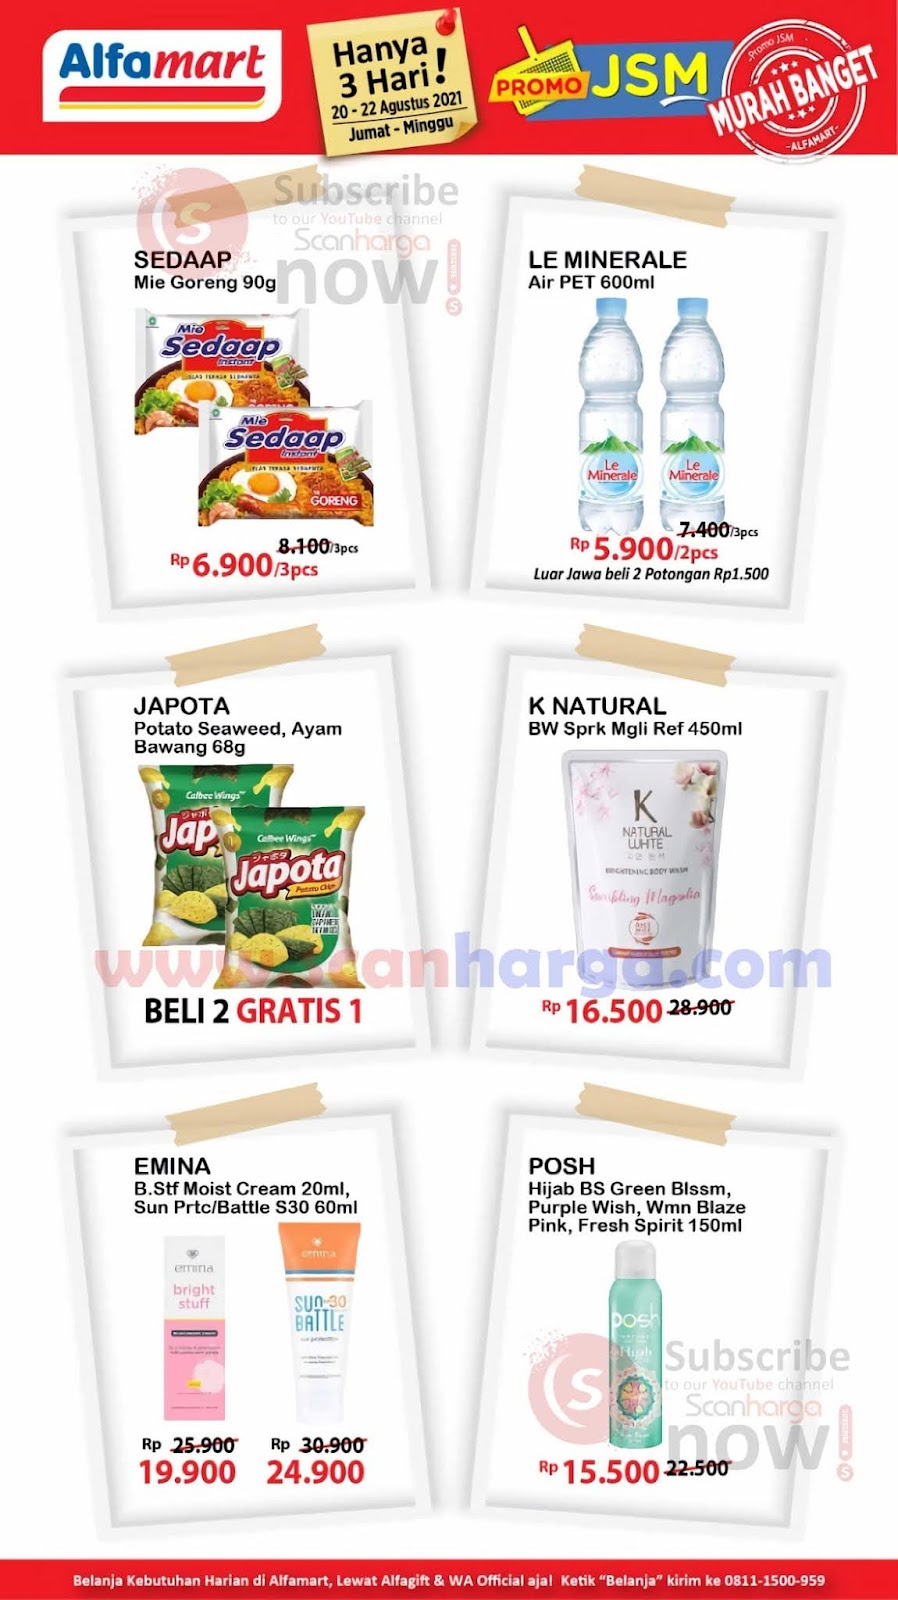 Katalog Promo JSM Alfamart Weekend 20 - 22 Agustus 2021 4